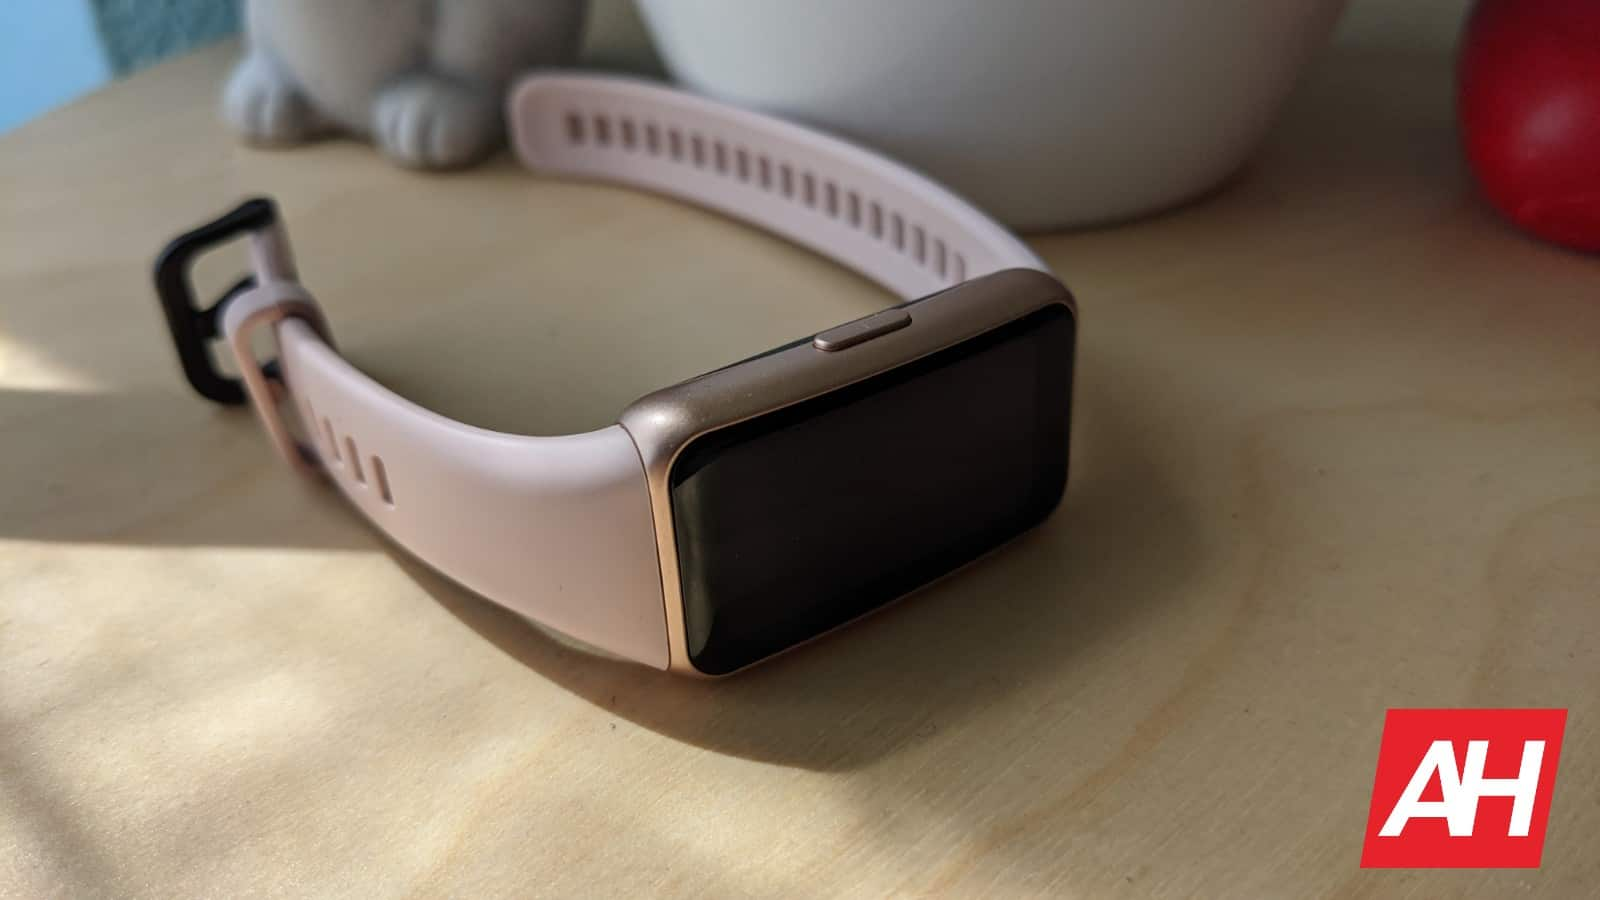 AH Huawei Band 6 image 14